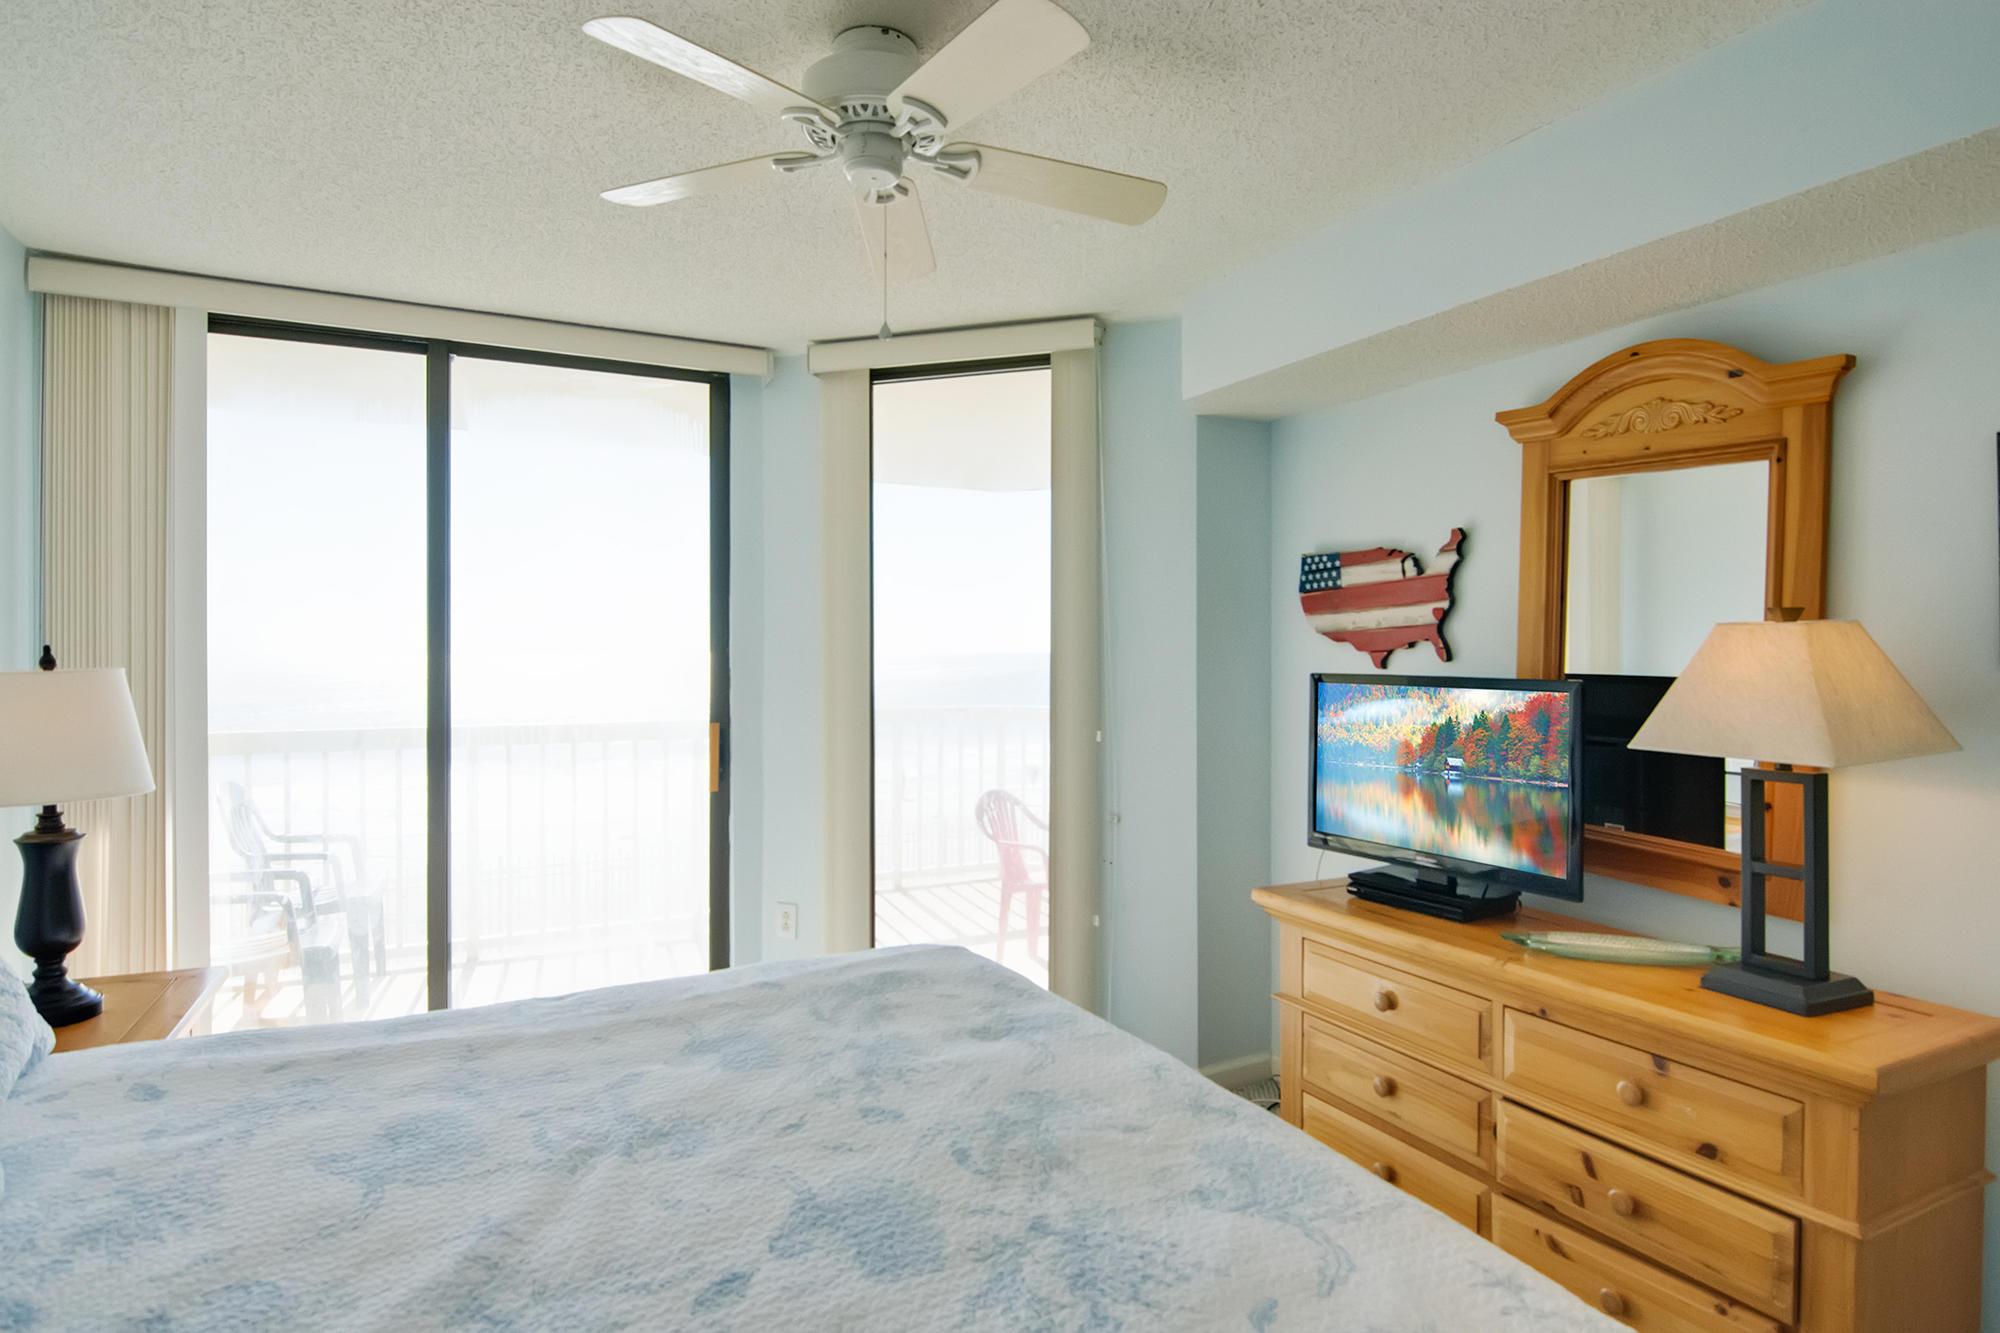 Charleston Oceanfront Villas Homes For Sale - 201 Arctic, Folly Beach, SC - 13